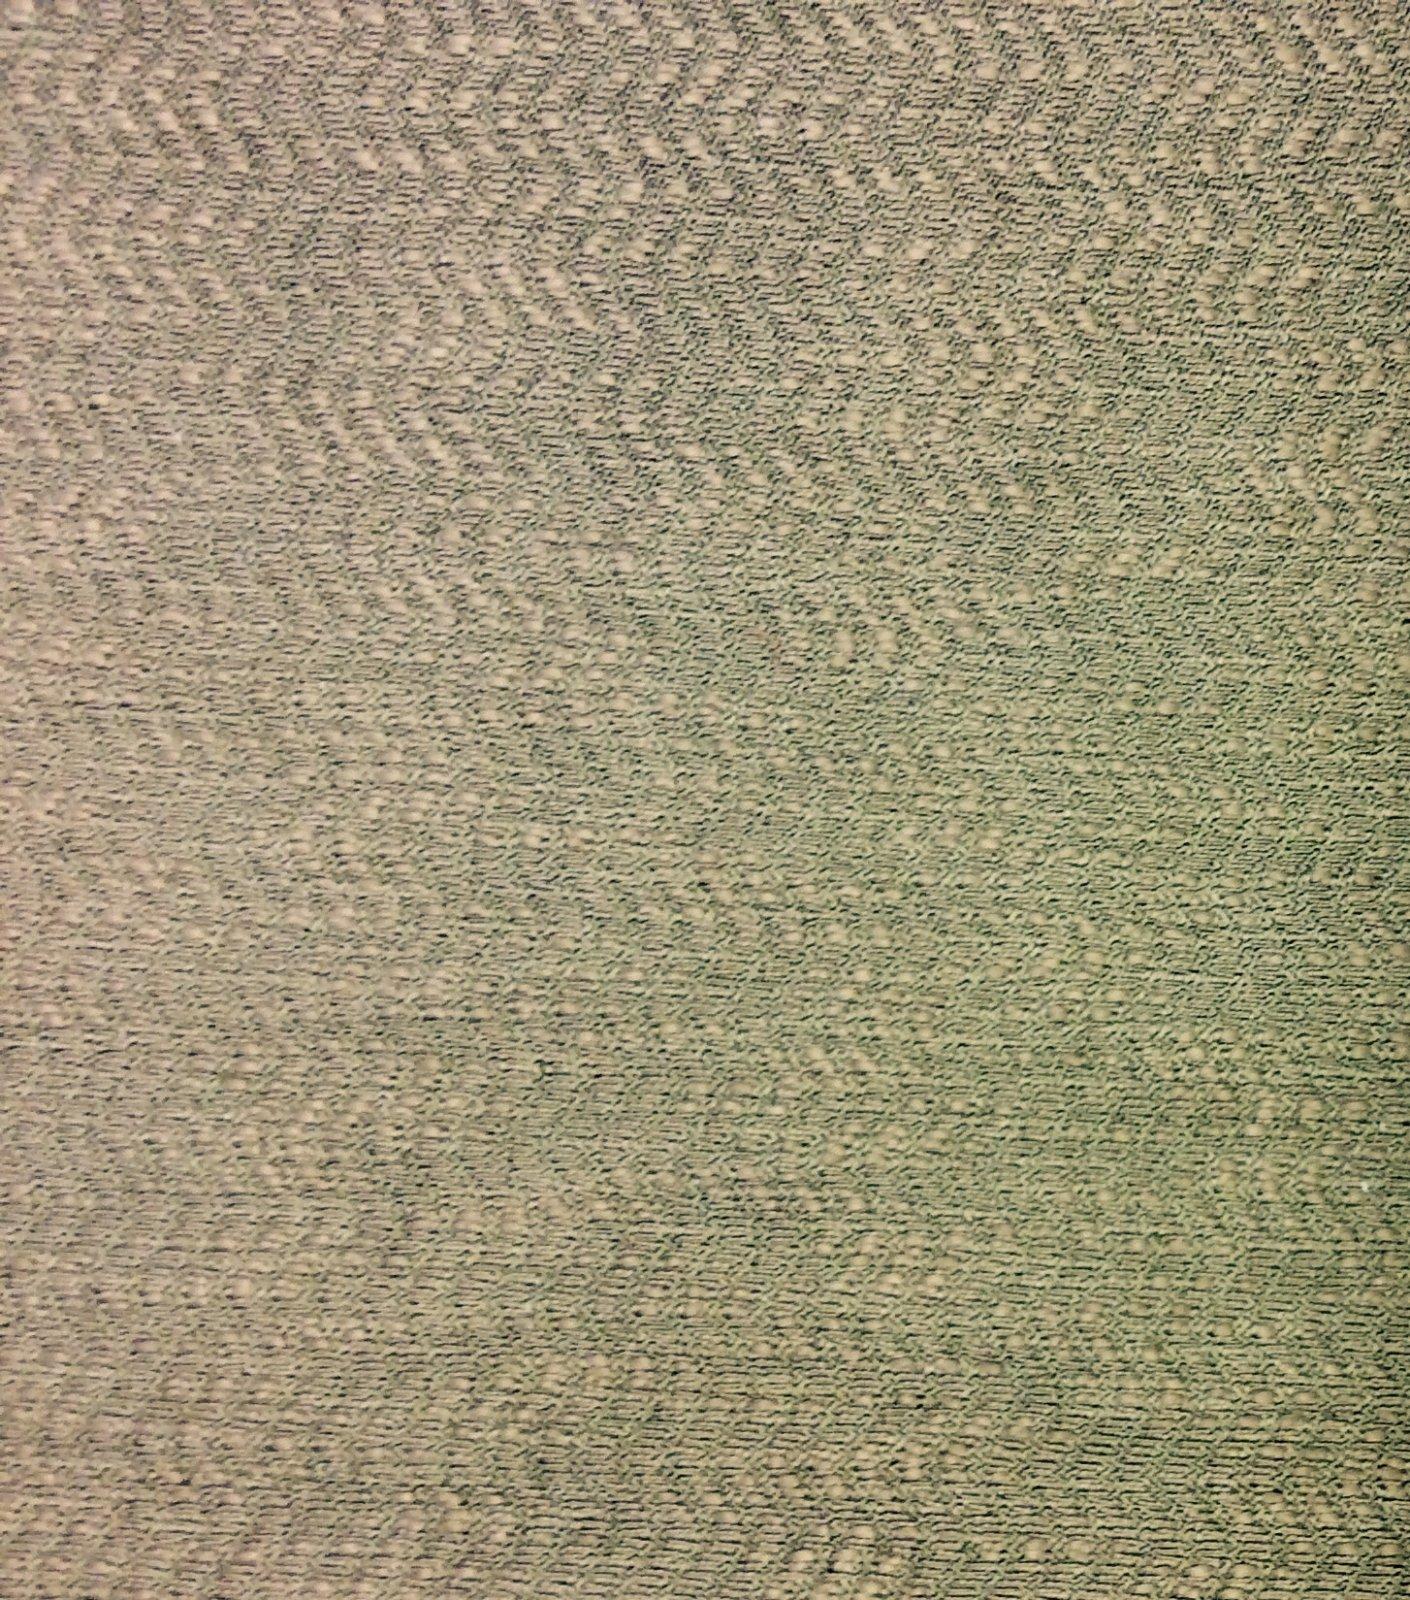 Salina Khaki Clarence House Made in Italy Upholstery Home Decor Fabric CLA1005